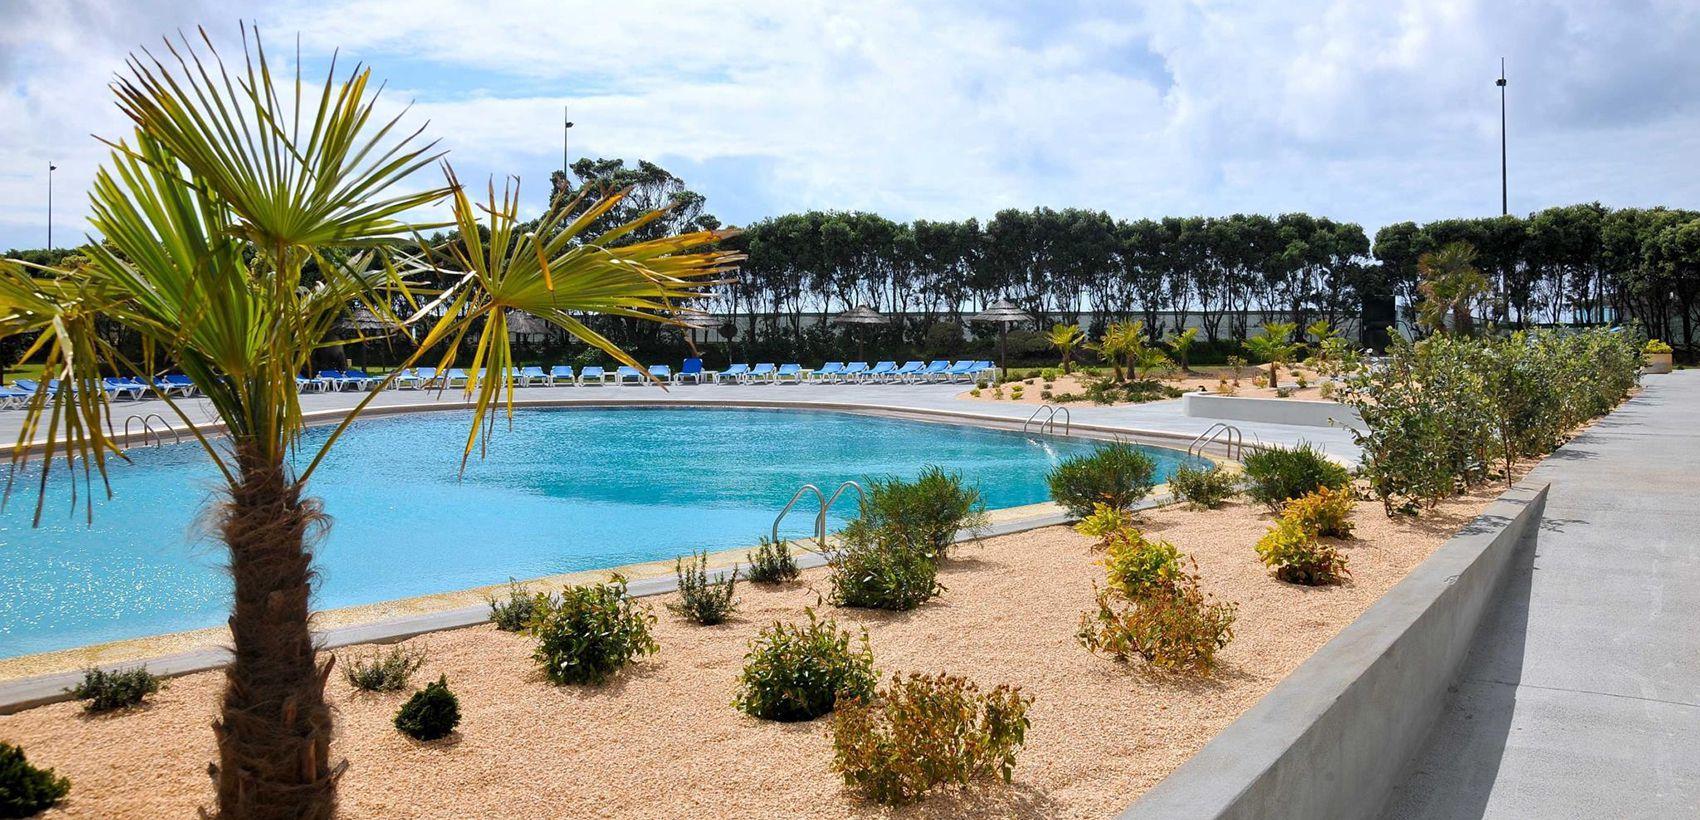 Ver o Mar a Dois: Axis Vermar Hotel